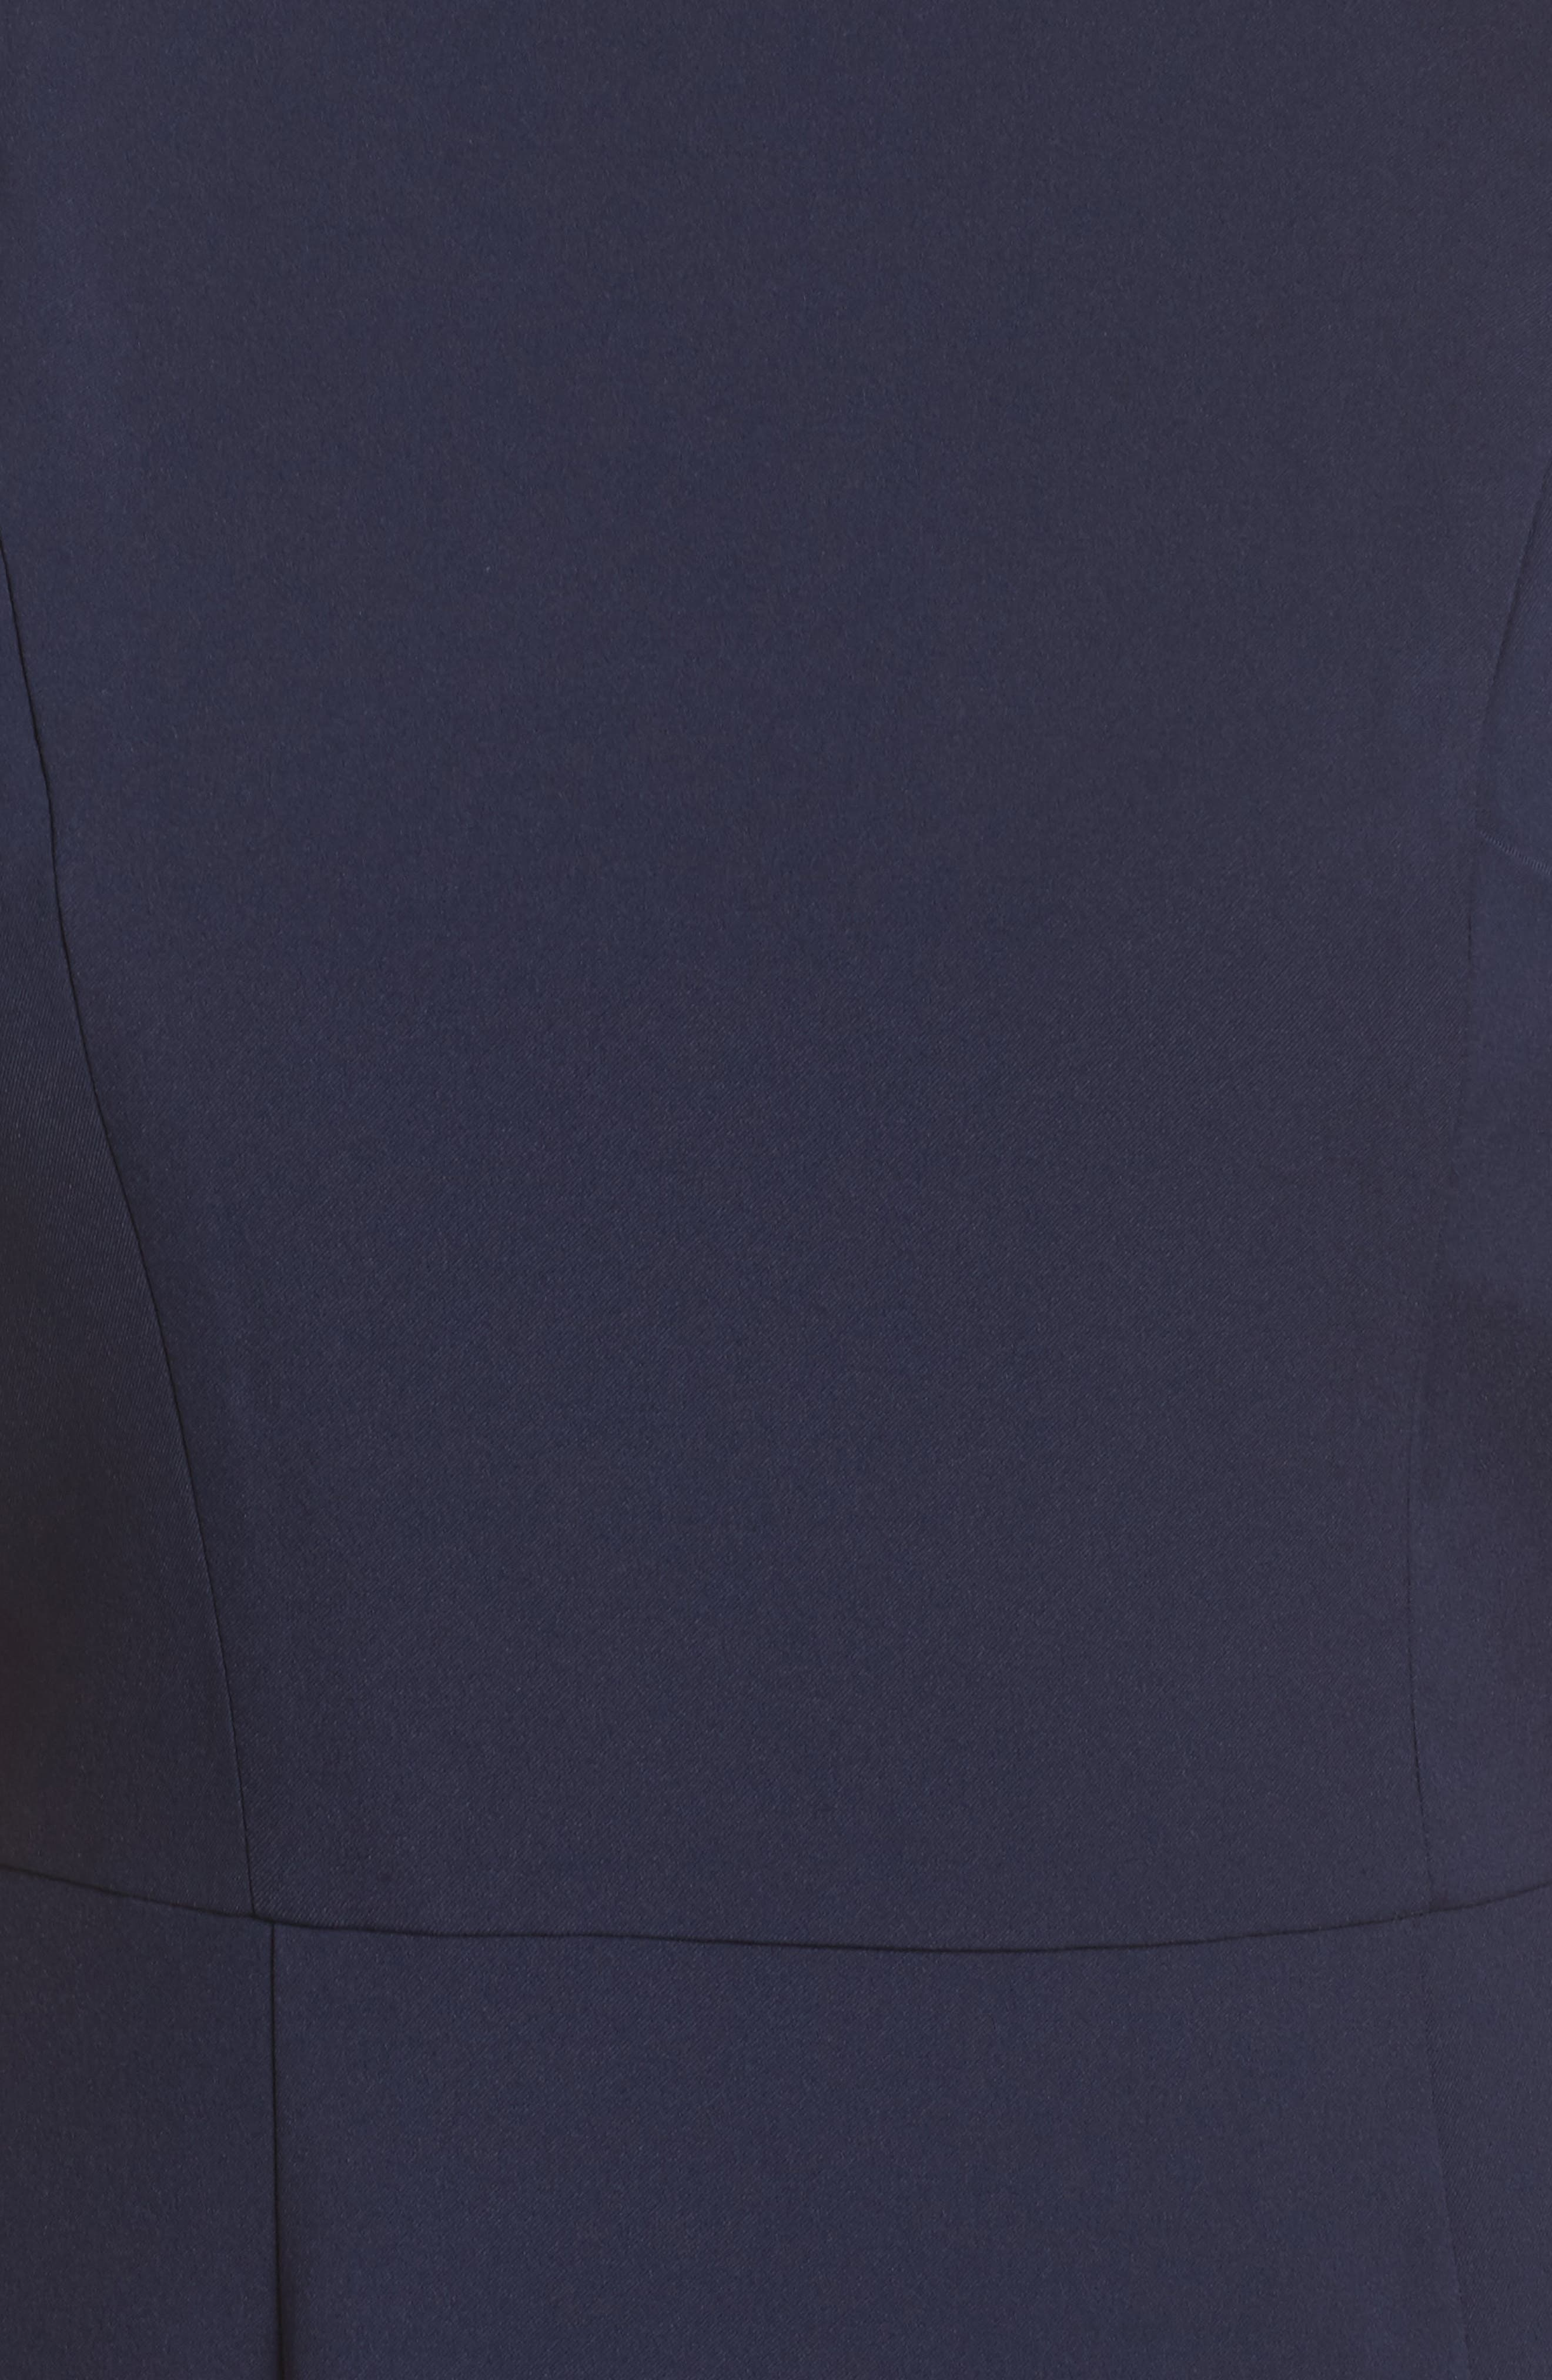 Jemima Ruffle Back Mermaid Gown,                             Alternate thumbnail 9, color,